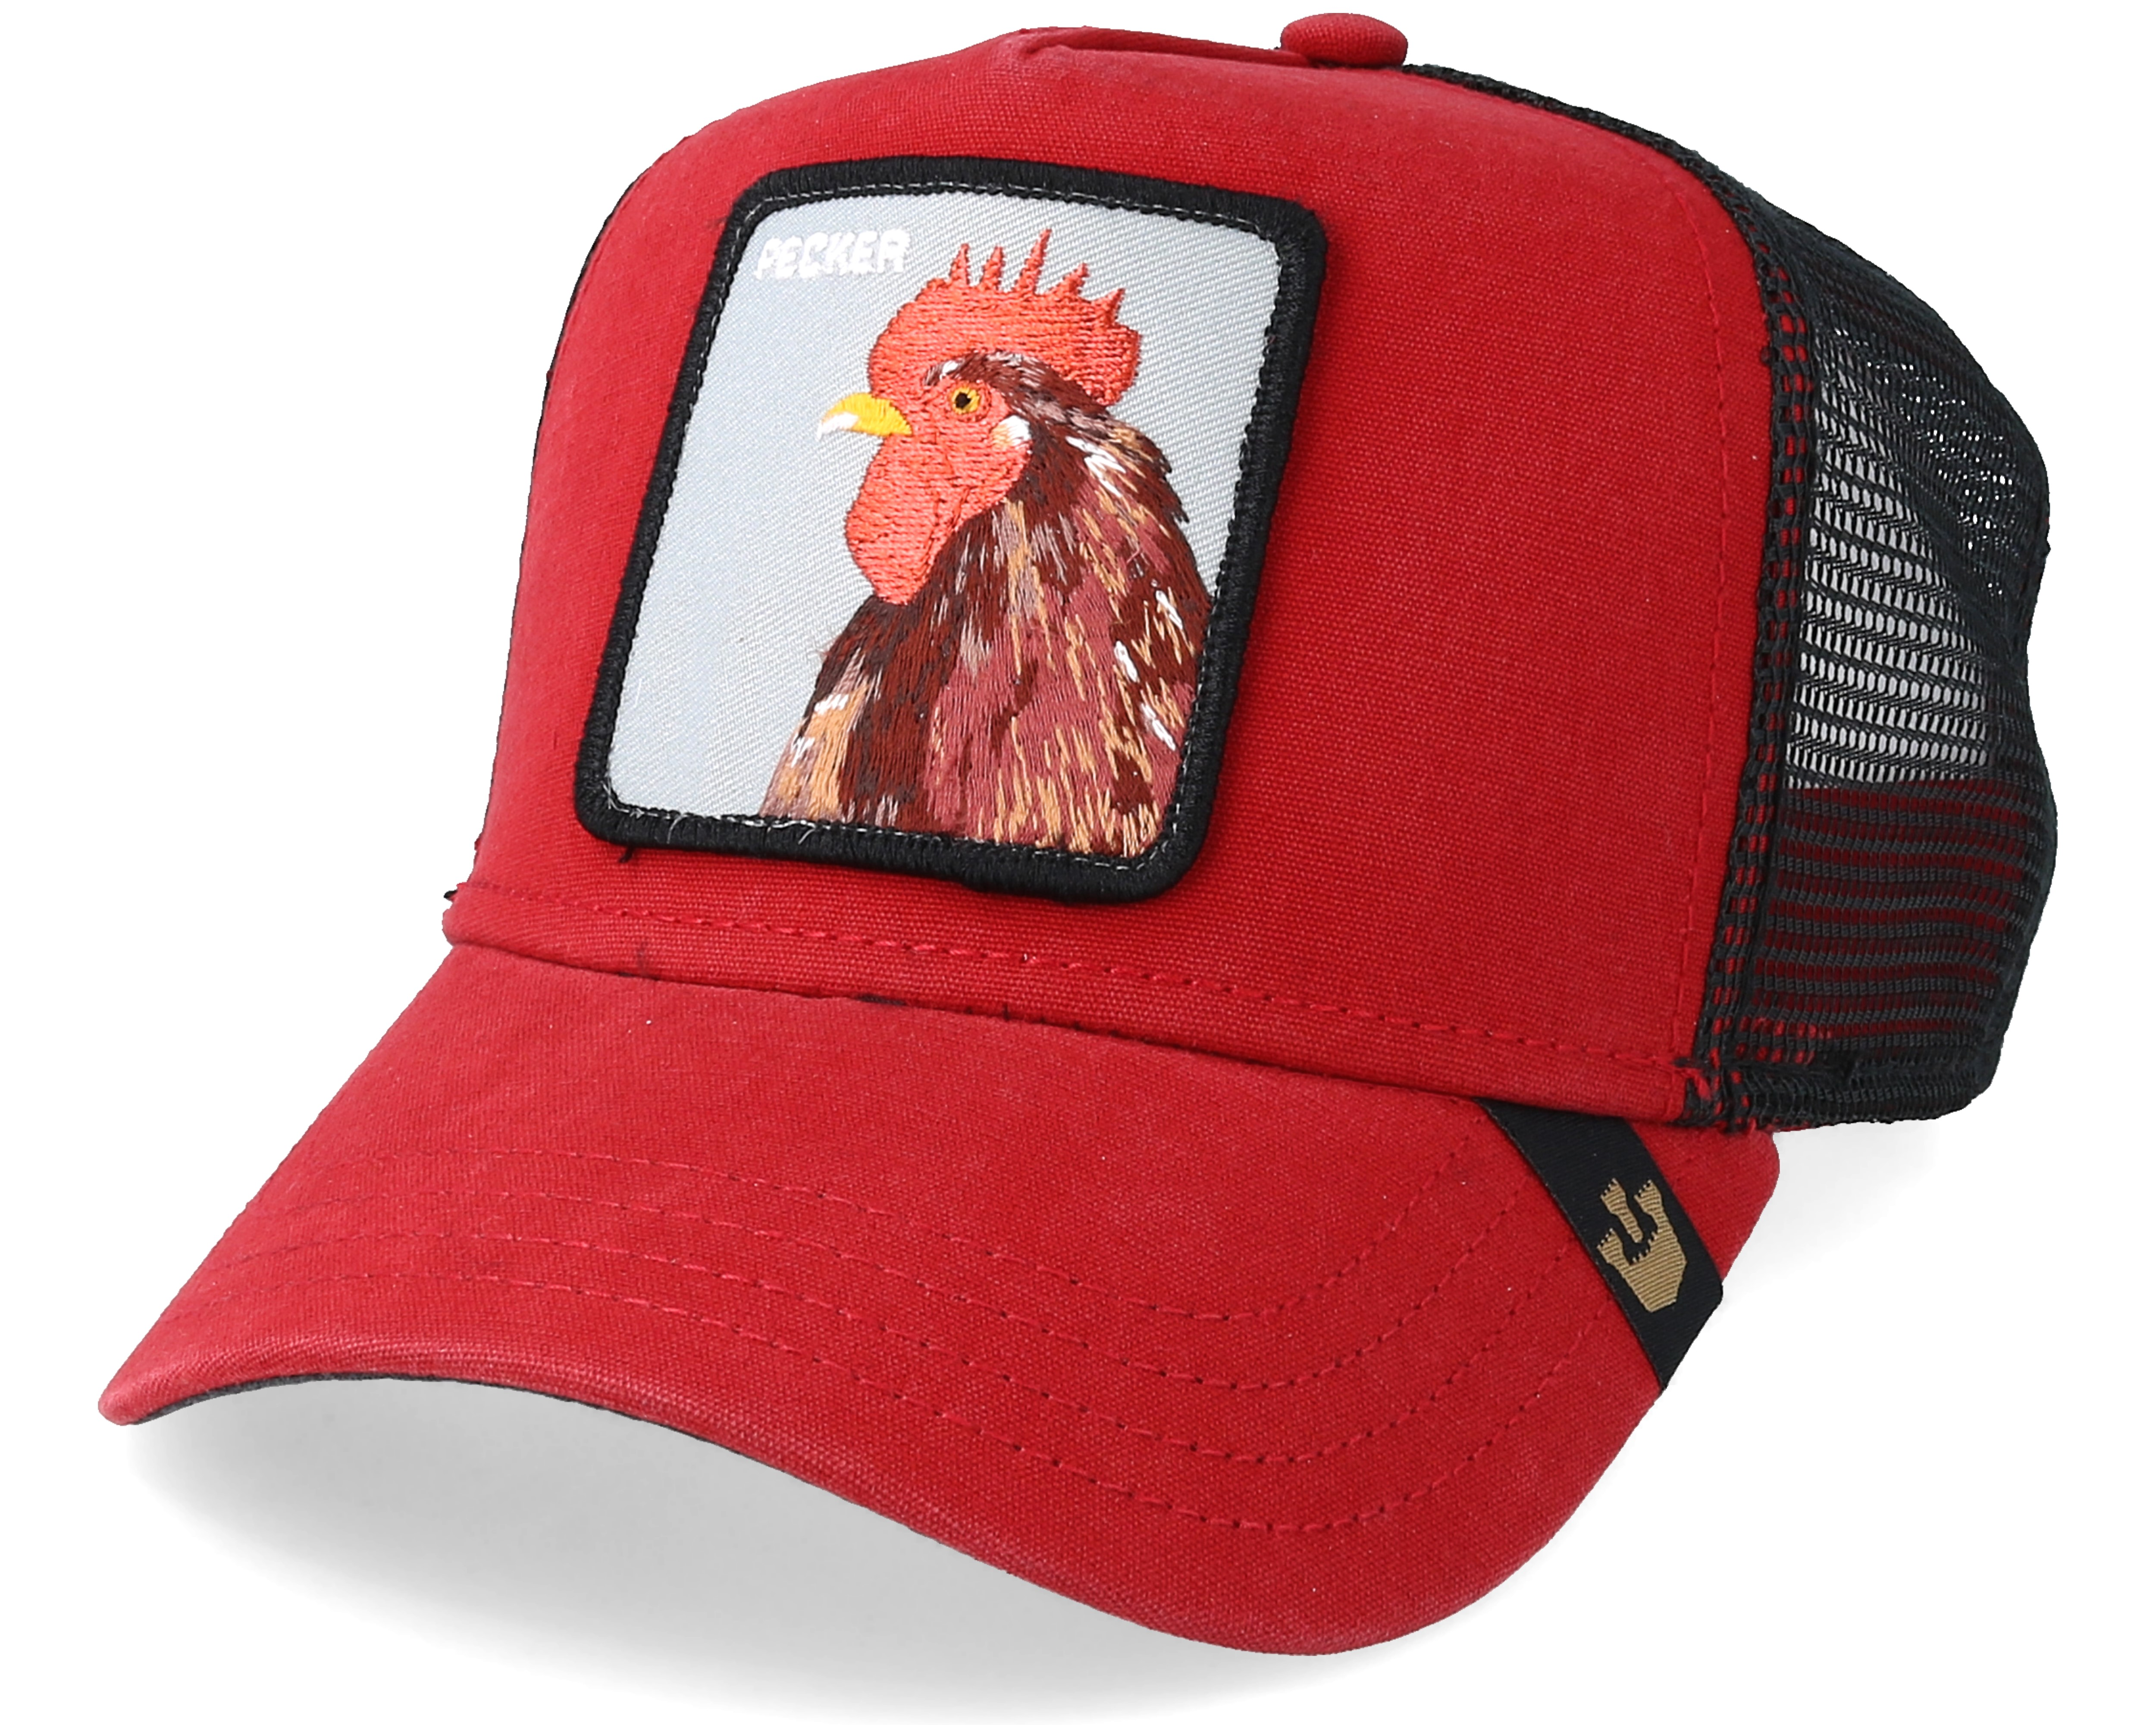 Plucker Baseball Cap Red Black Trucker Goorin Bros Caps